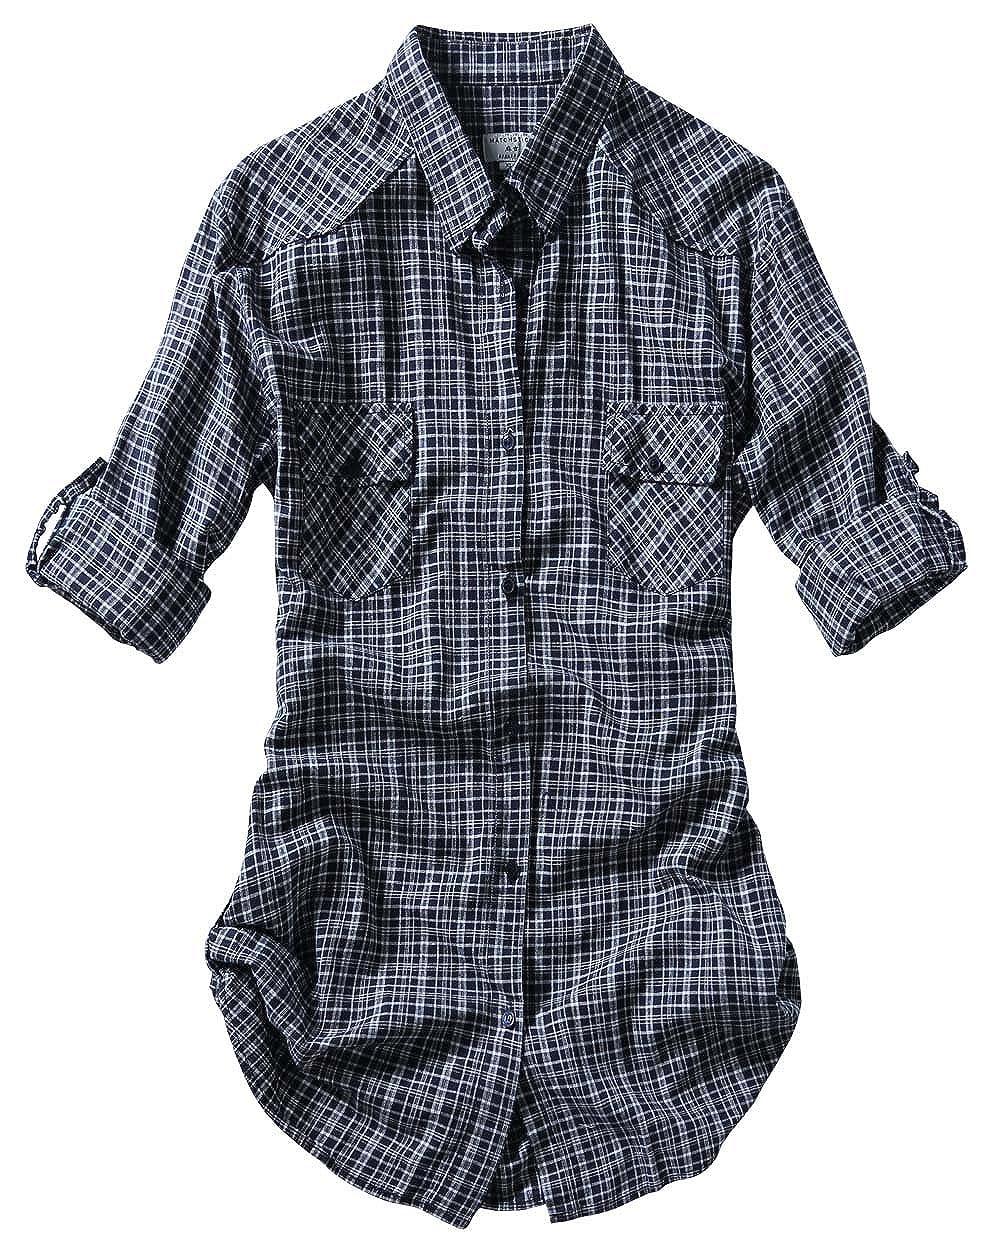 2022 Check 3 Match Women's Long Sleeve Flannel Plaid Shirt